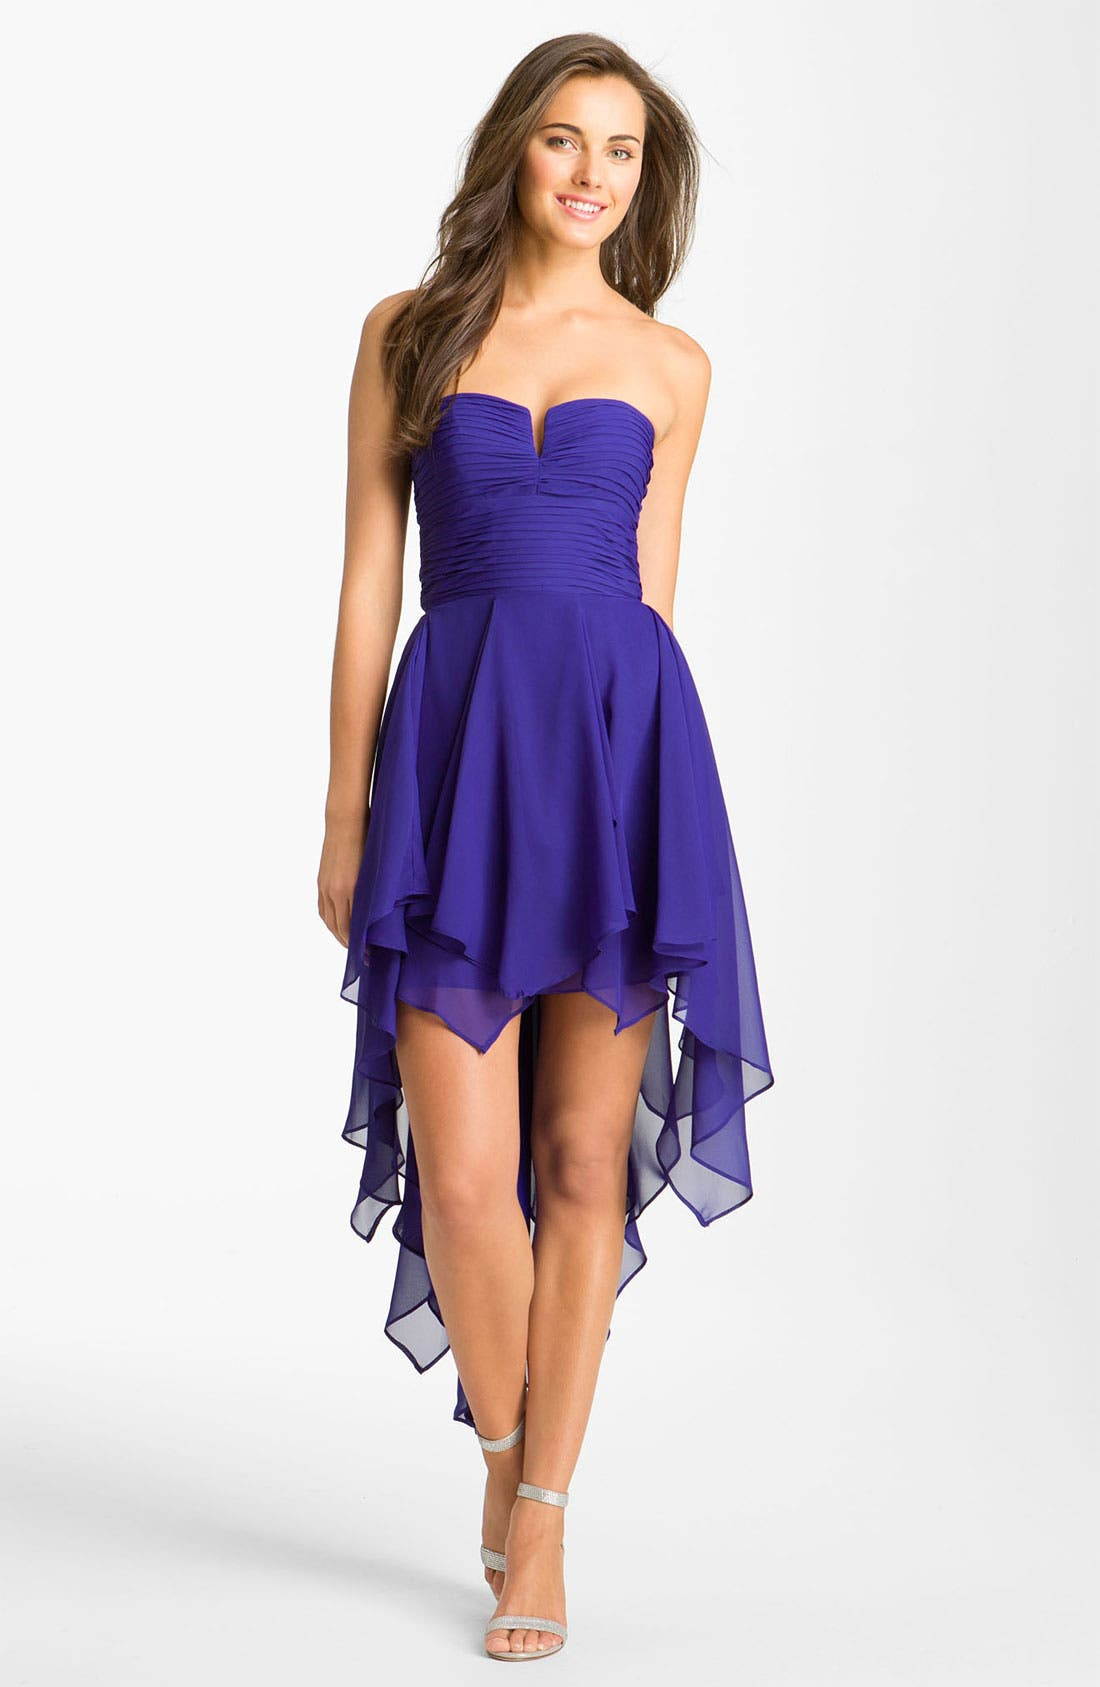 Main Image - Hailey by Adrianna Papell Notched Bodice Chiffon Dress